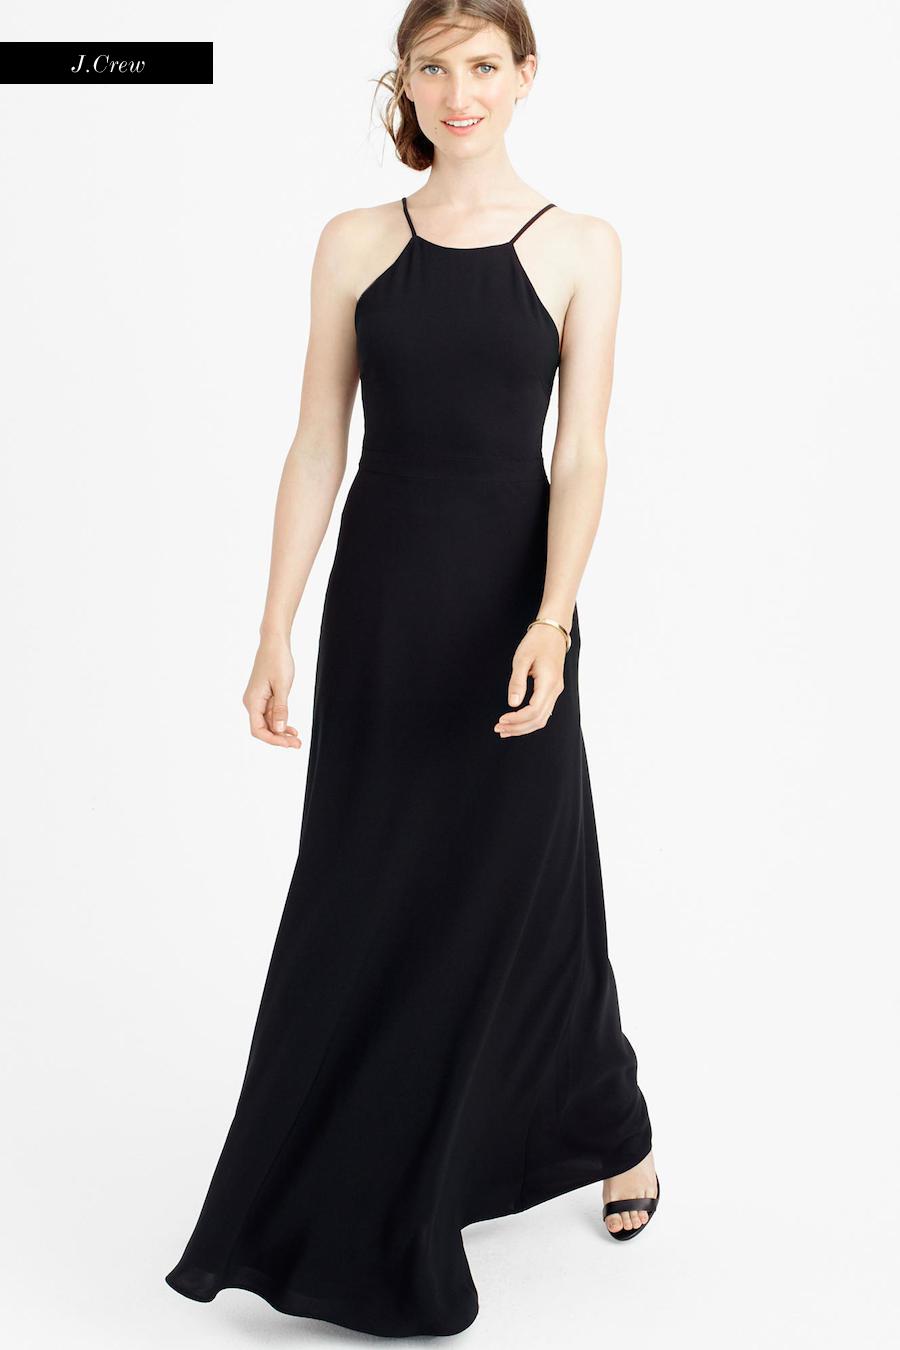 Maxi dress under 200 fash-n-chips.com 4